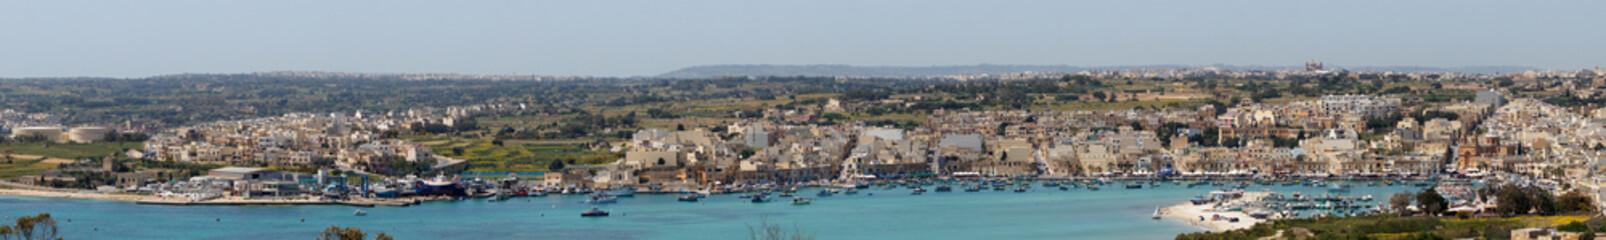 Foto op Canvas ville de Marsaxlokk